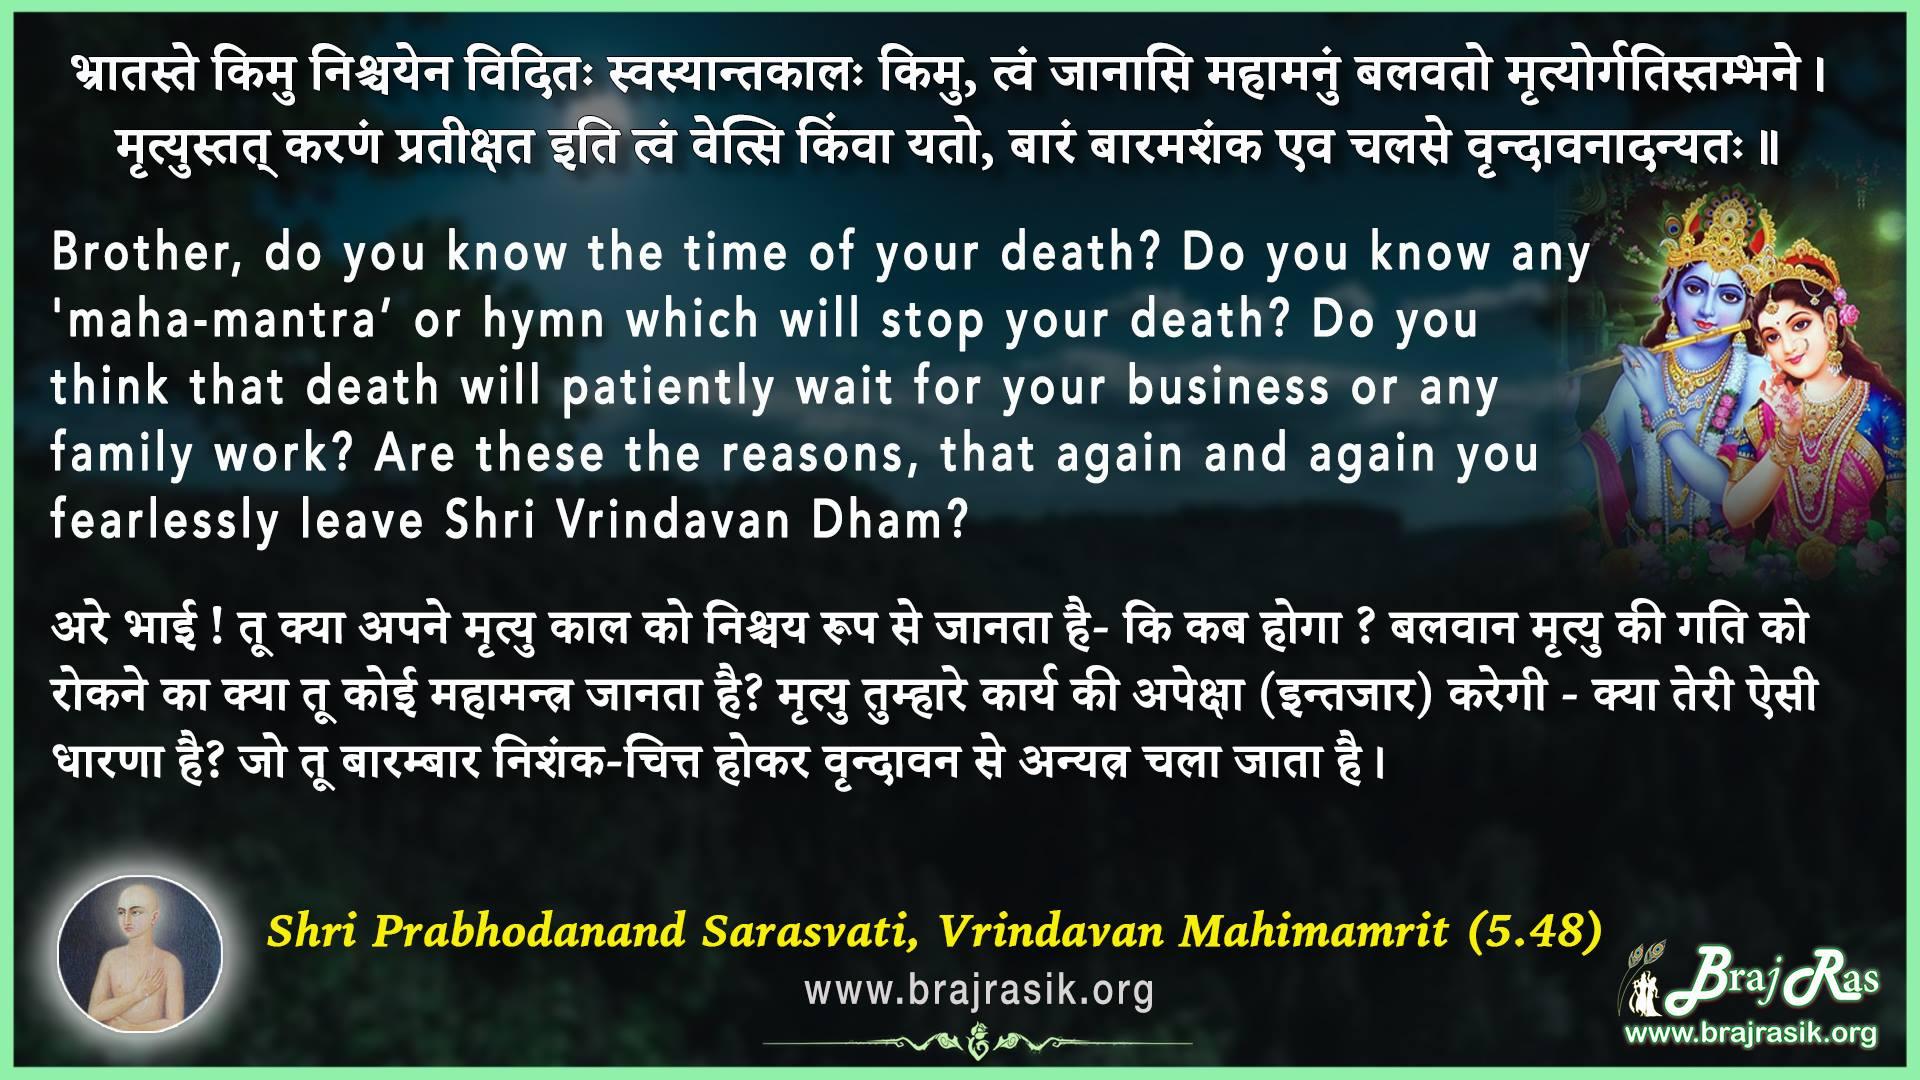 Brathaste Kimu Nischayen Vidita - Shri Prabodhananda Sarasvati, Vrindavan Mahimamrit (1.50)